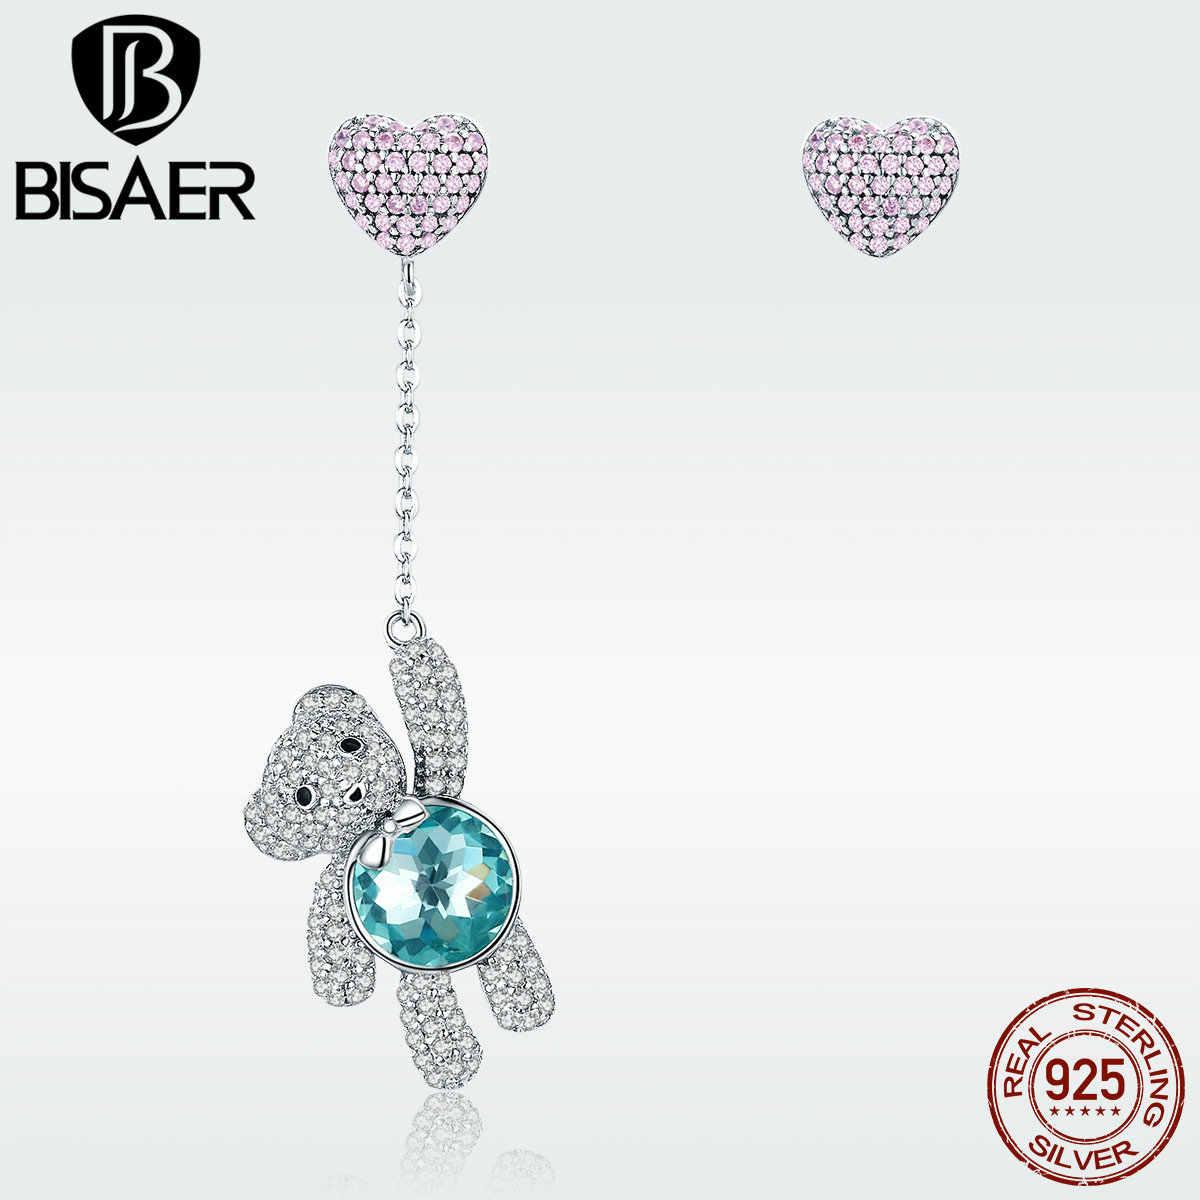 Love ตุ๊กตาหมีต่างหู 925 เงินสเตอร์ลิงสีชมพู CZ หัวใจบอลลูนสีฟ้าหมีคริสตัล Drop ต่างหูสำหรับสาวของขวัญวันเกิด GXE388